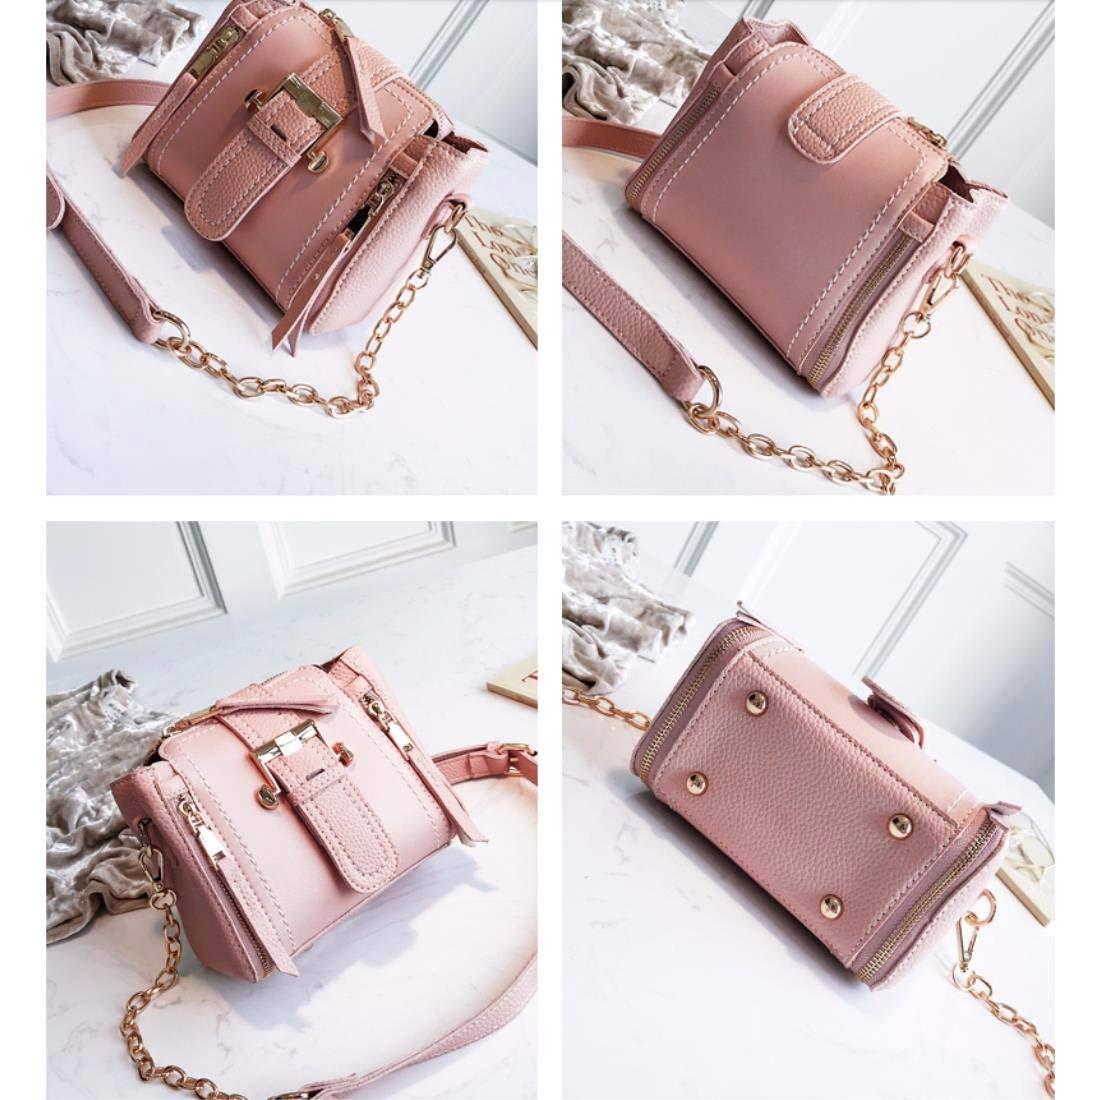 LIUXINDA-BB Umhängetasche aus Leder Leder Studio Handtasche Handtasche Handtasche Damen Schwarz B07GPJN51B Umhngetaschen Qualitätsprodukte 3e2ef1